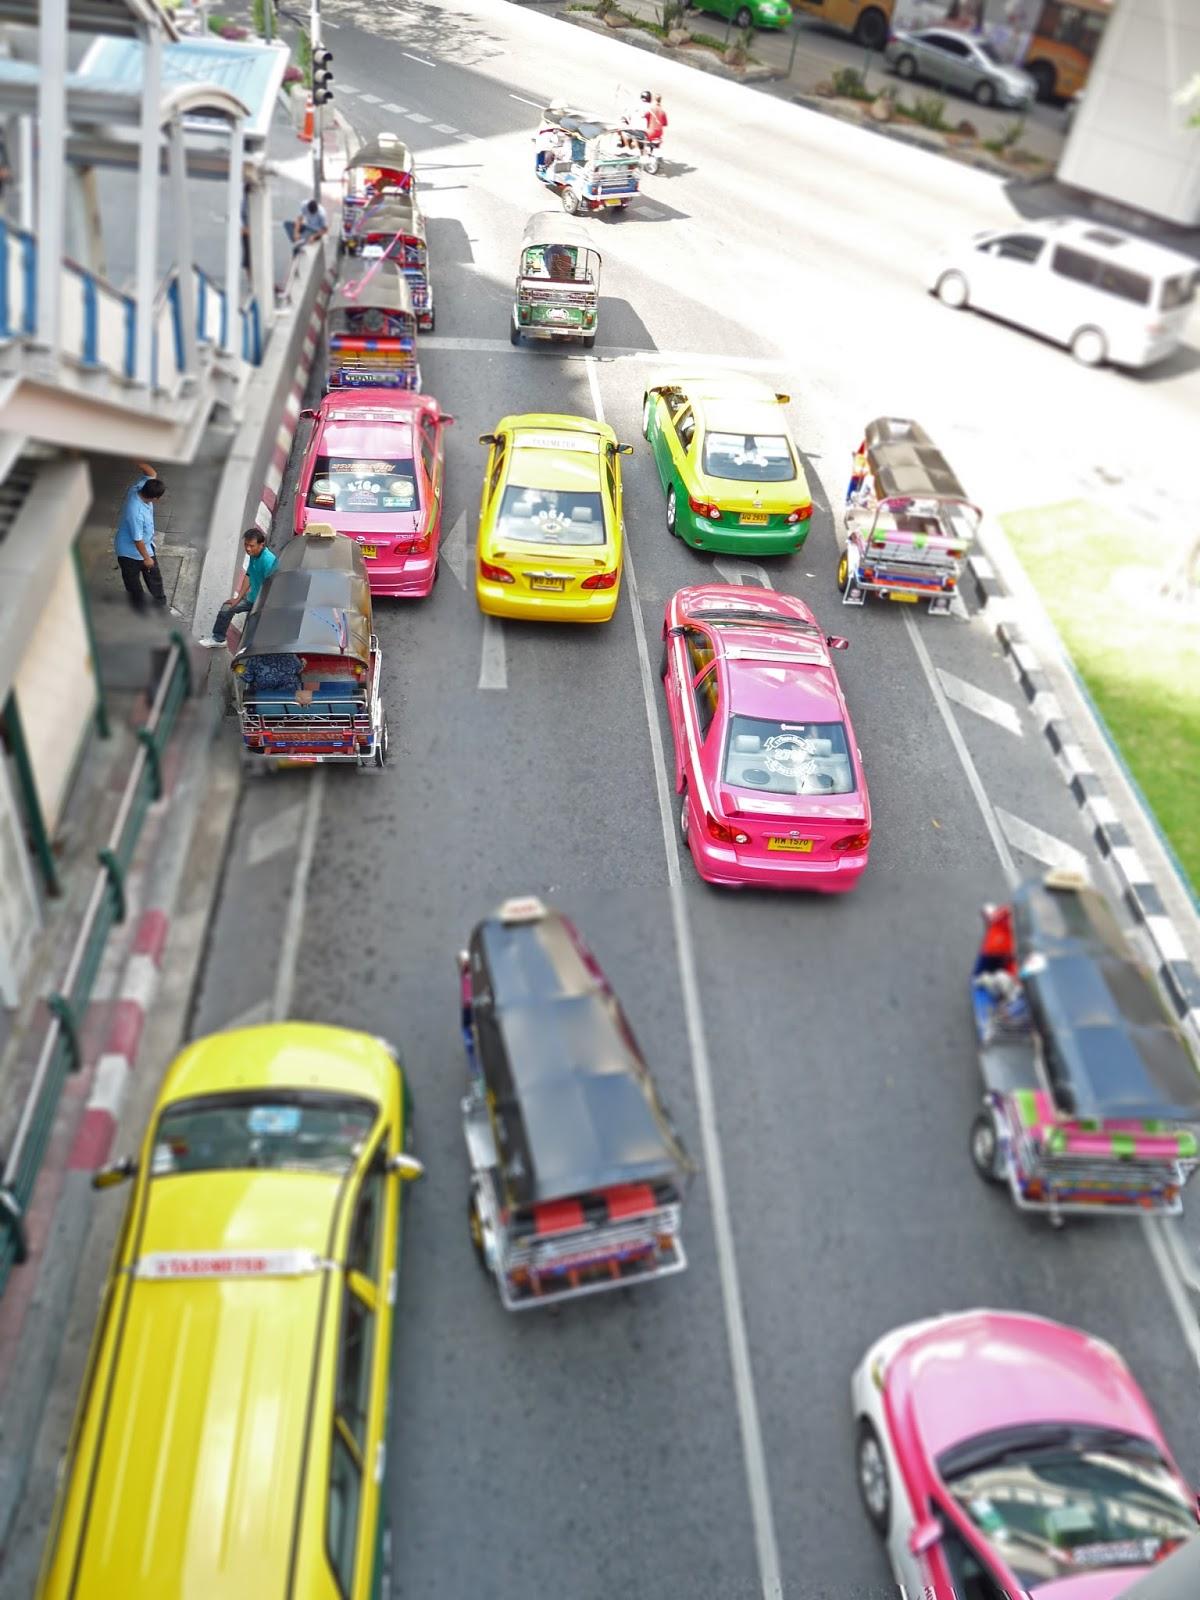 Thailand Taxi Cabs